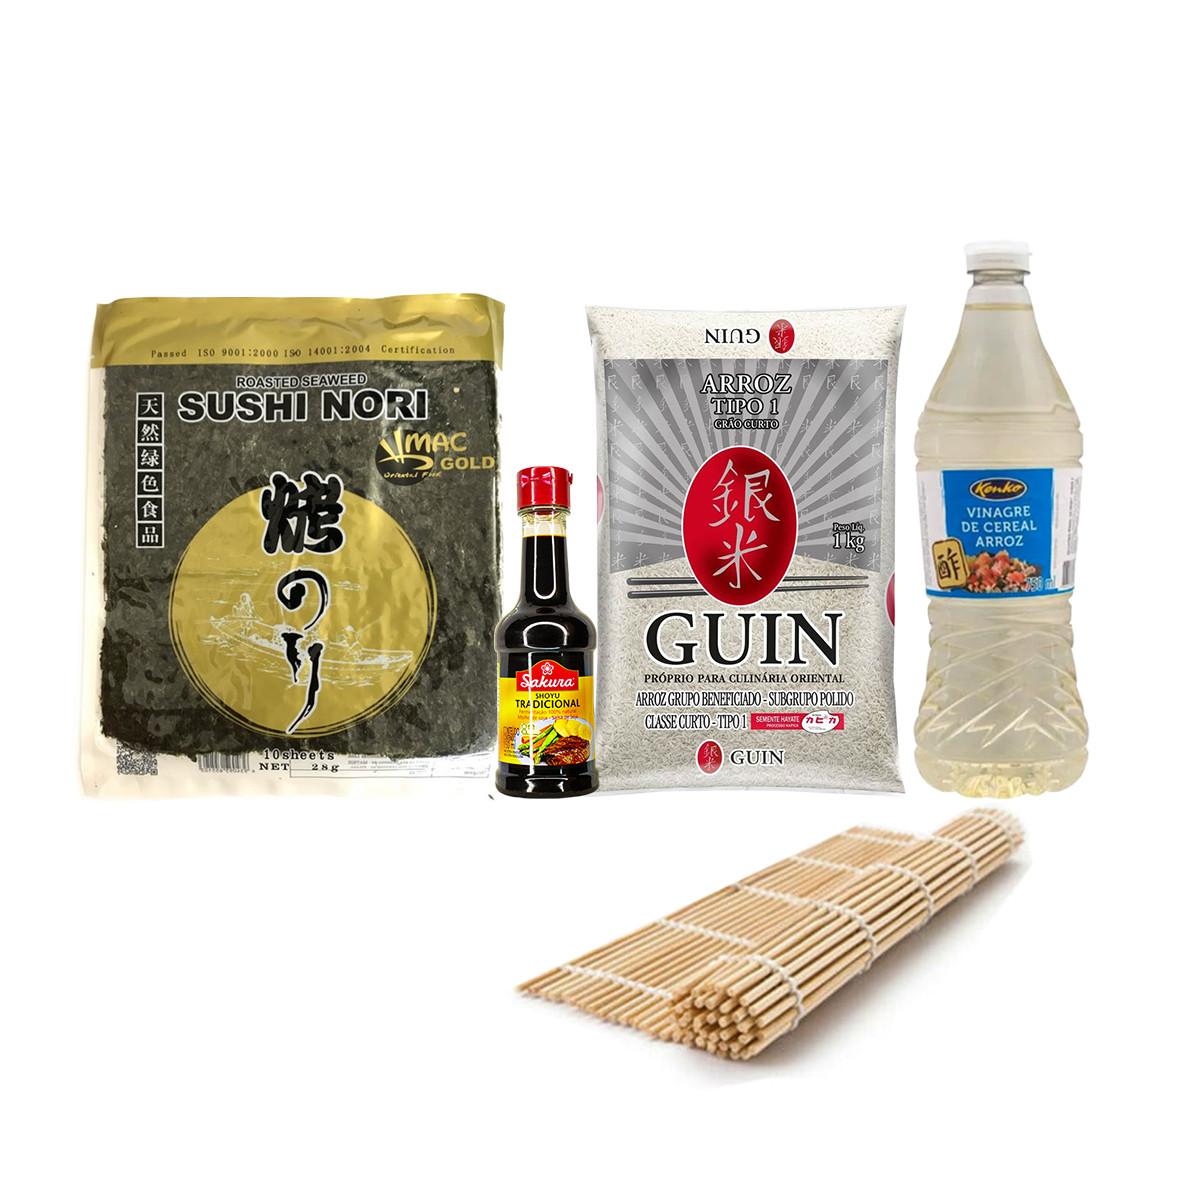 Kit Sushi Oriental para Sushi - Esteira, Alga, Arroz, Shoyu e Vinagre